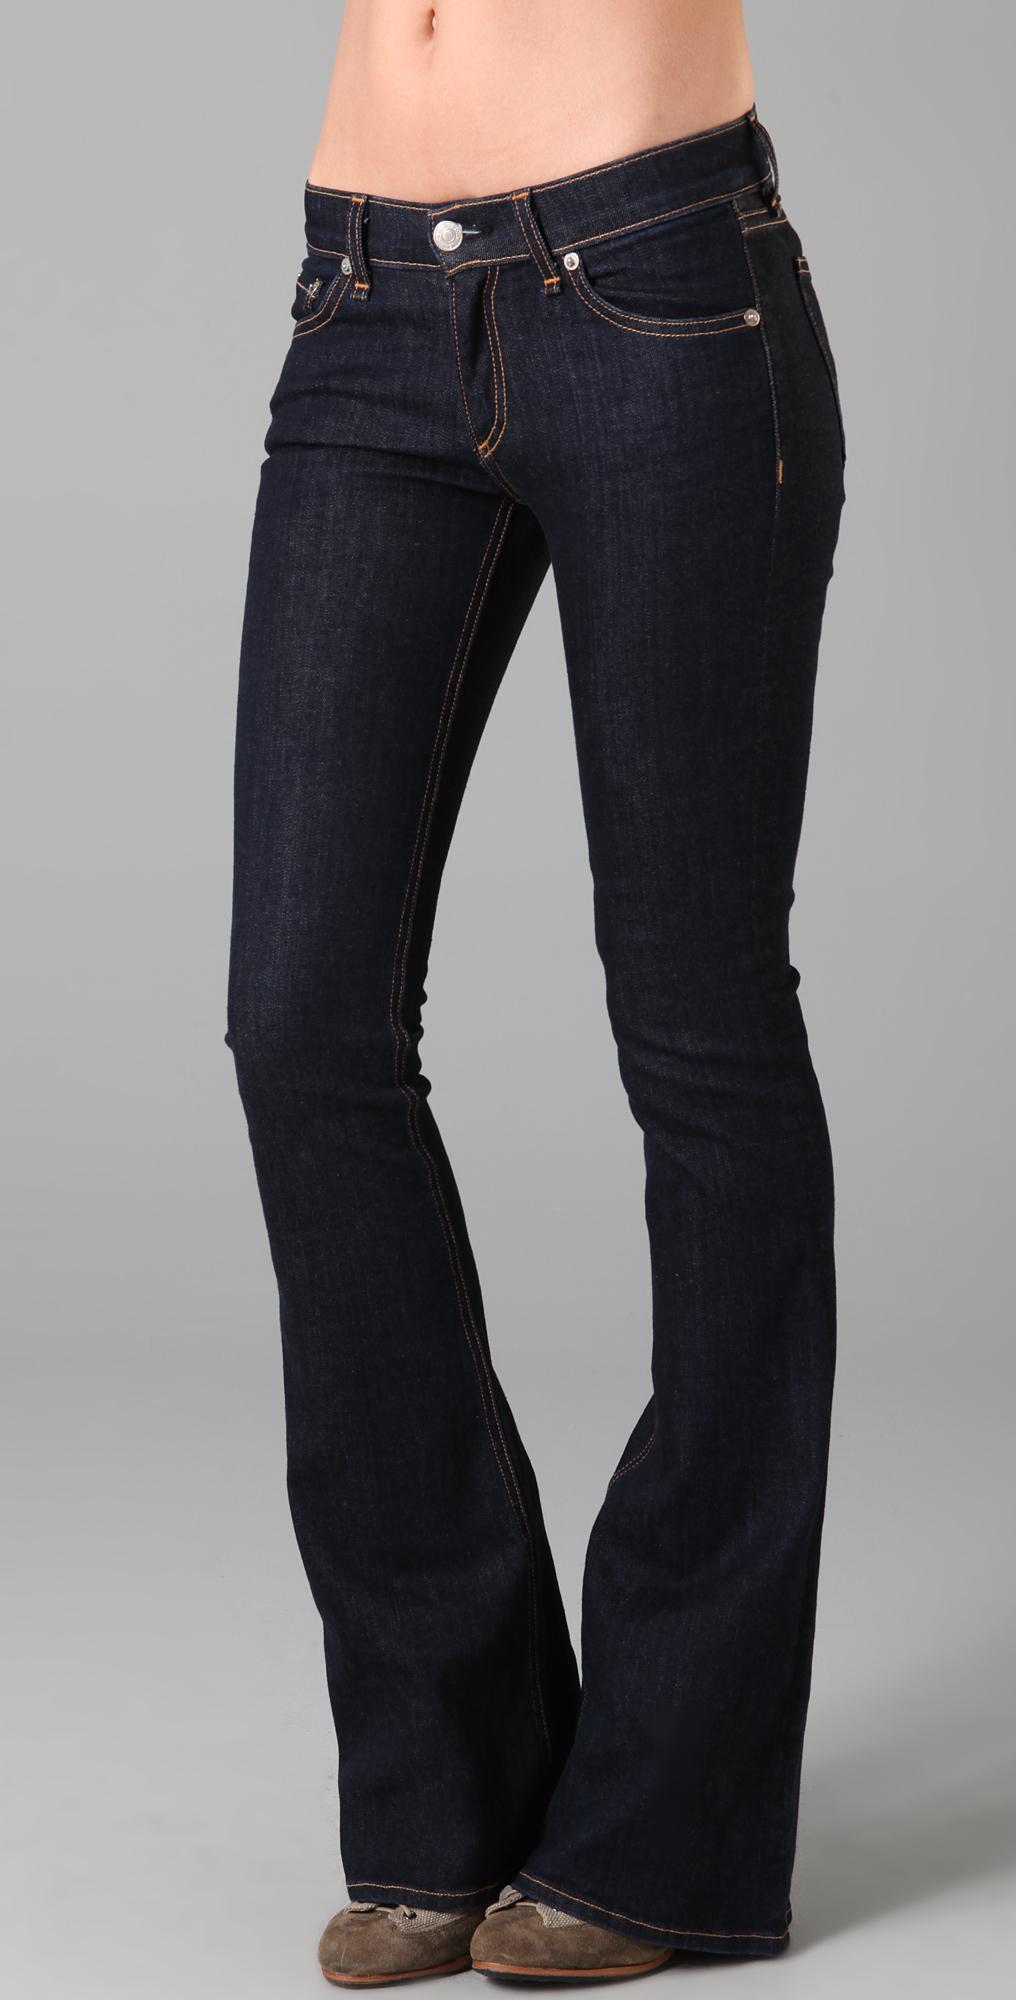 Rag & Bone/JEAN Elephant Bell Bottom Jeans | 15% off first app ...